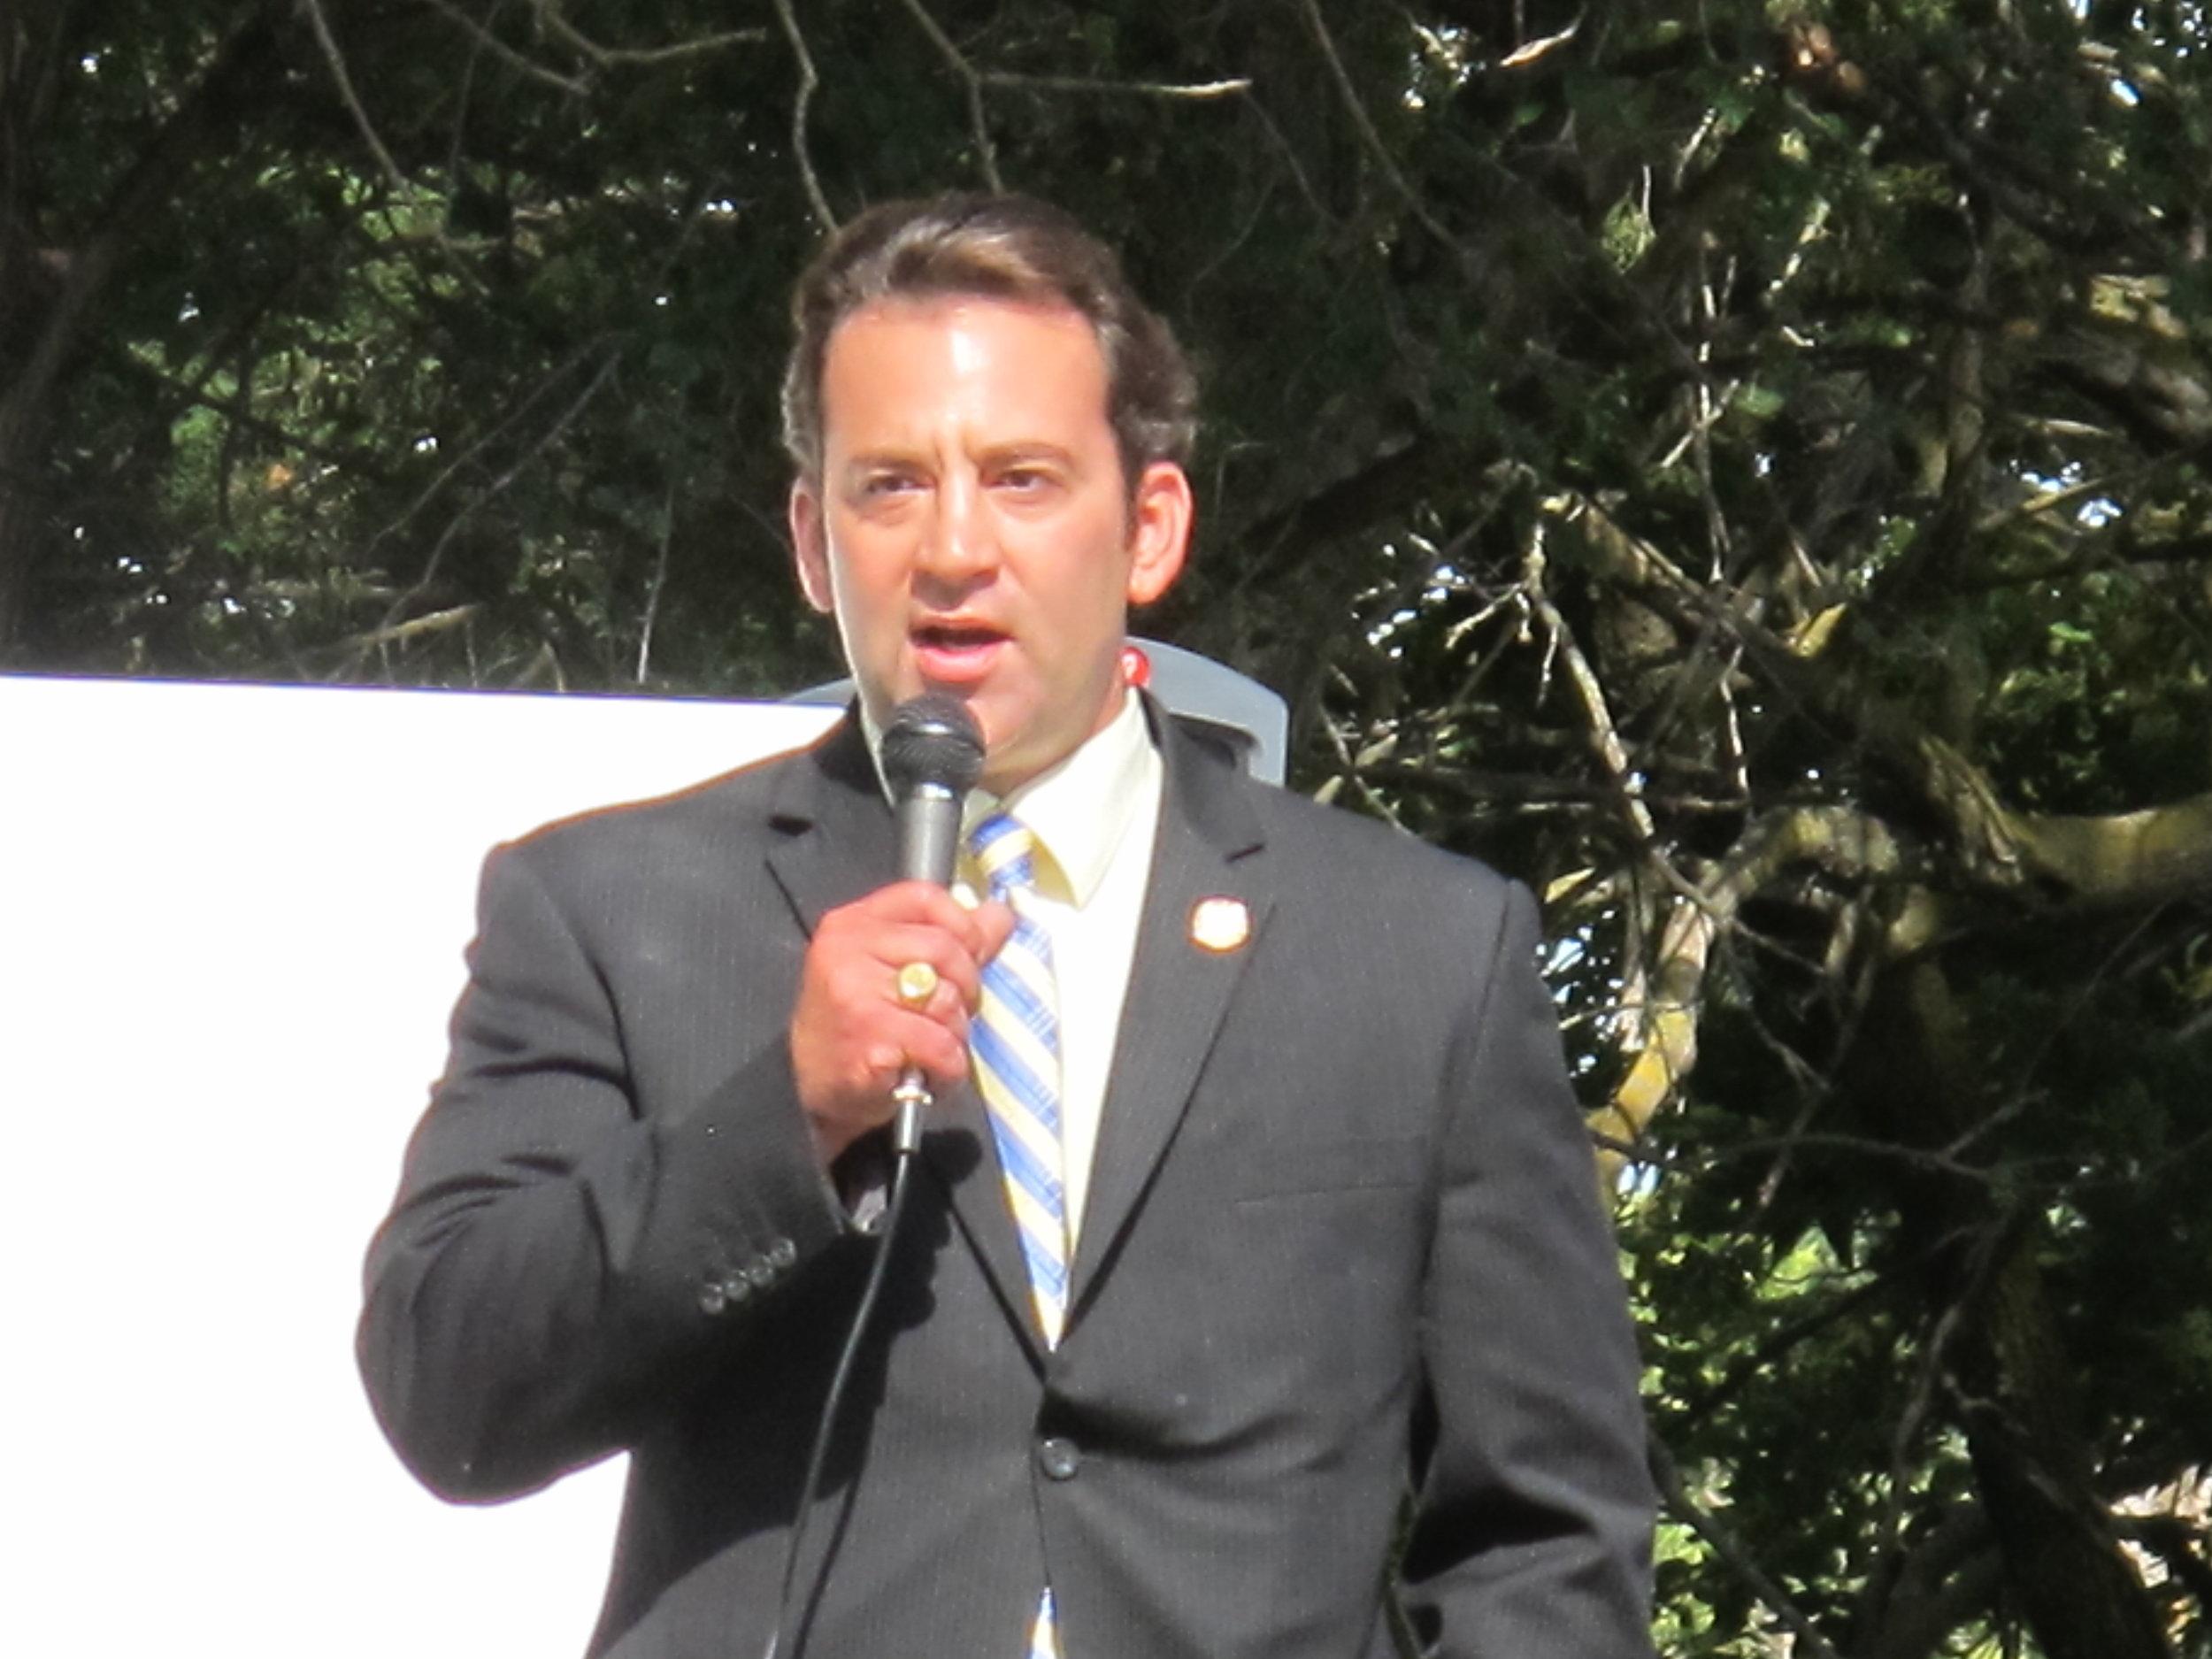 Kansas Representative Troy Waymaster